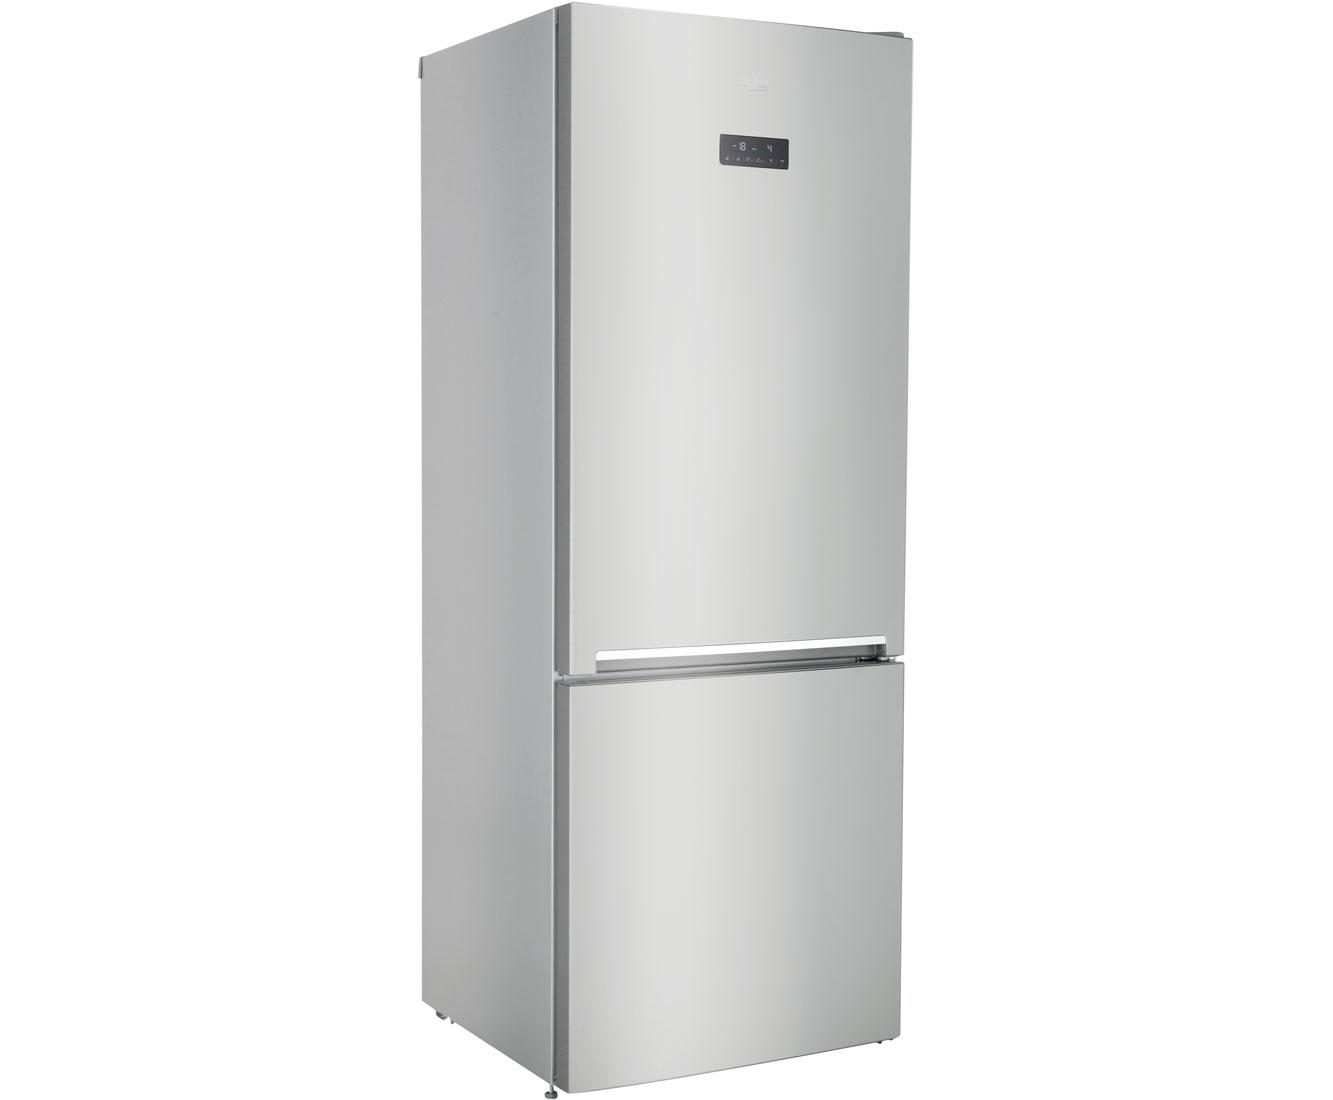 Bomann Kühlschrank Flaschenhalter : Rabatt preisvergleich.de haushalt u003e kühlschränke u003e kühl